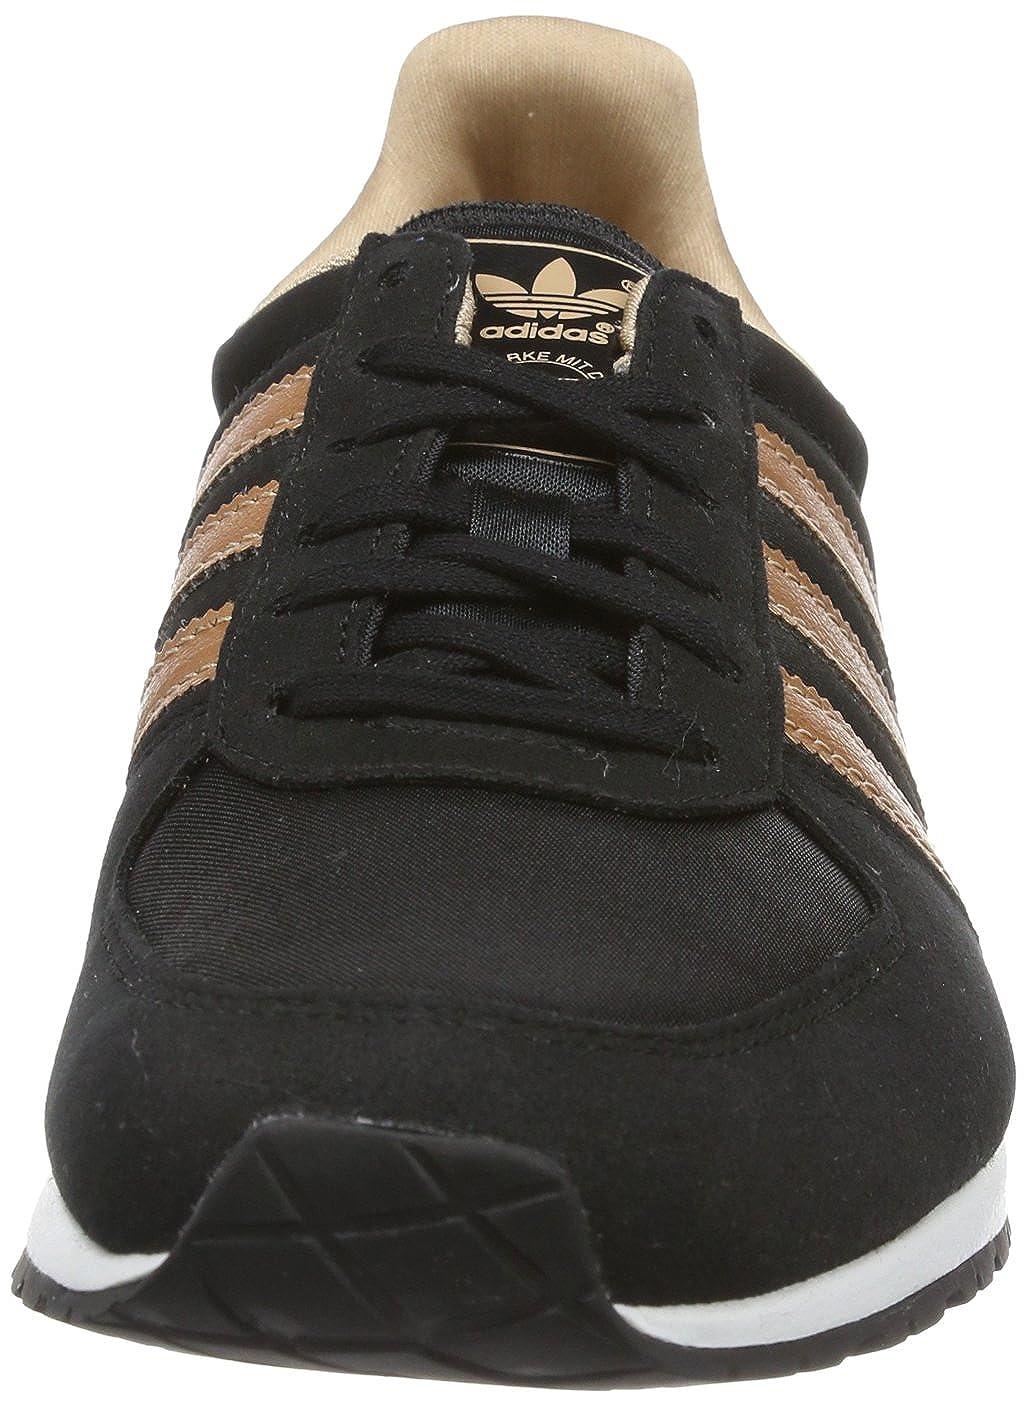 996a7b4ab0e adidas Originals Womens Adistar Racer W-3 Trainers D65483 Black Rose Gold  Metal Rose Gold Metal 3.5 UK